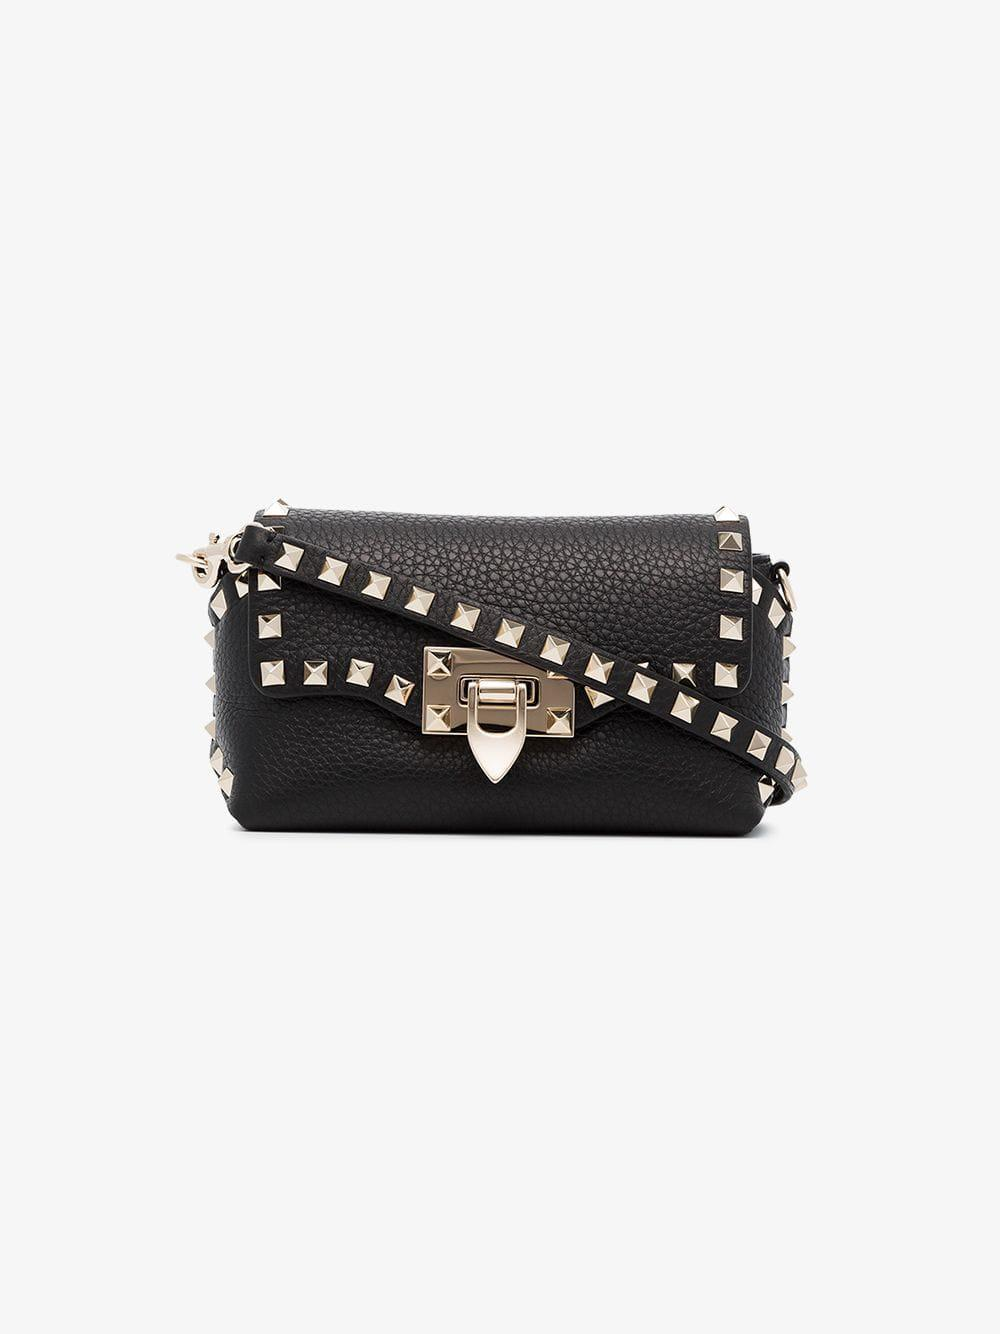 133c0b90e271 Valentino - Black Rockstud Mini Leather Crossbody Bag - Lyst. View  fullscreen